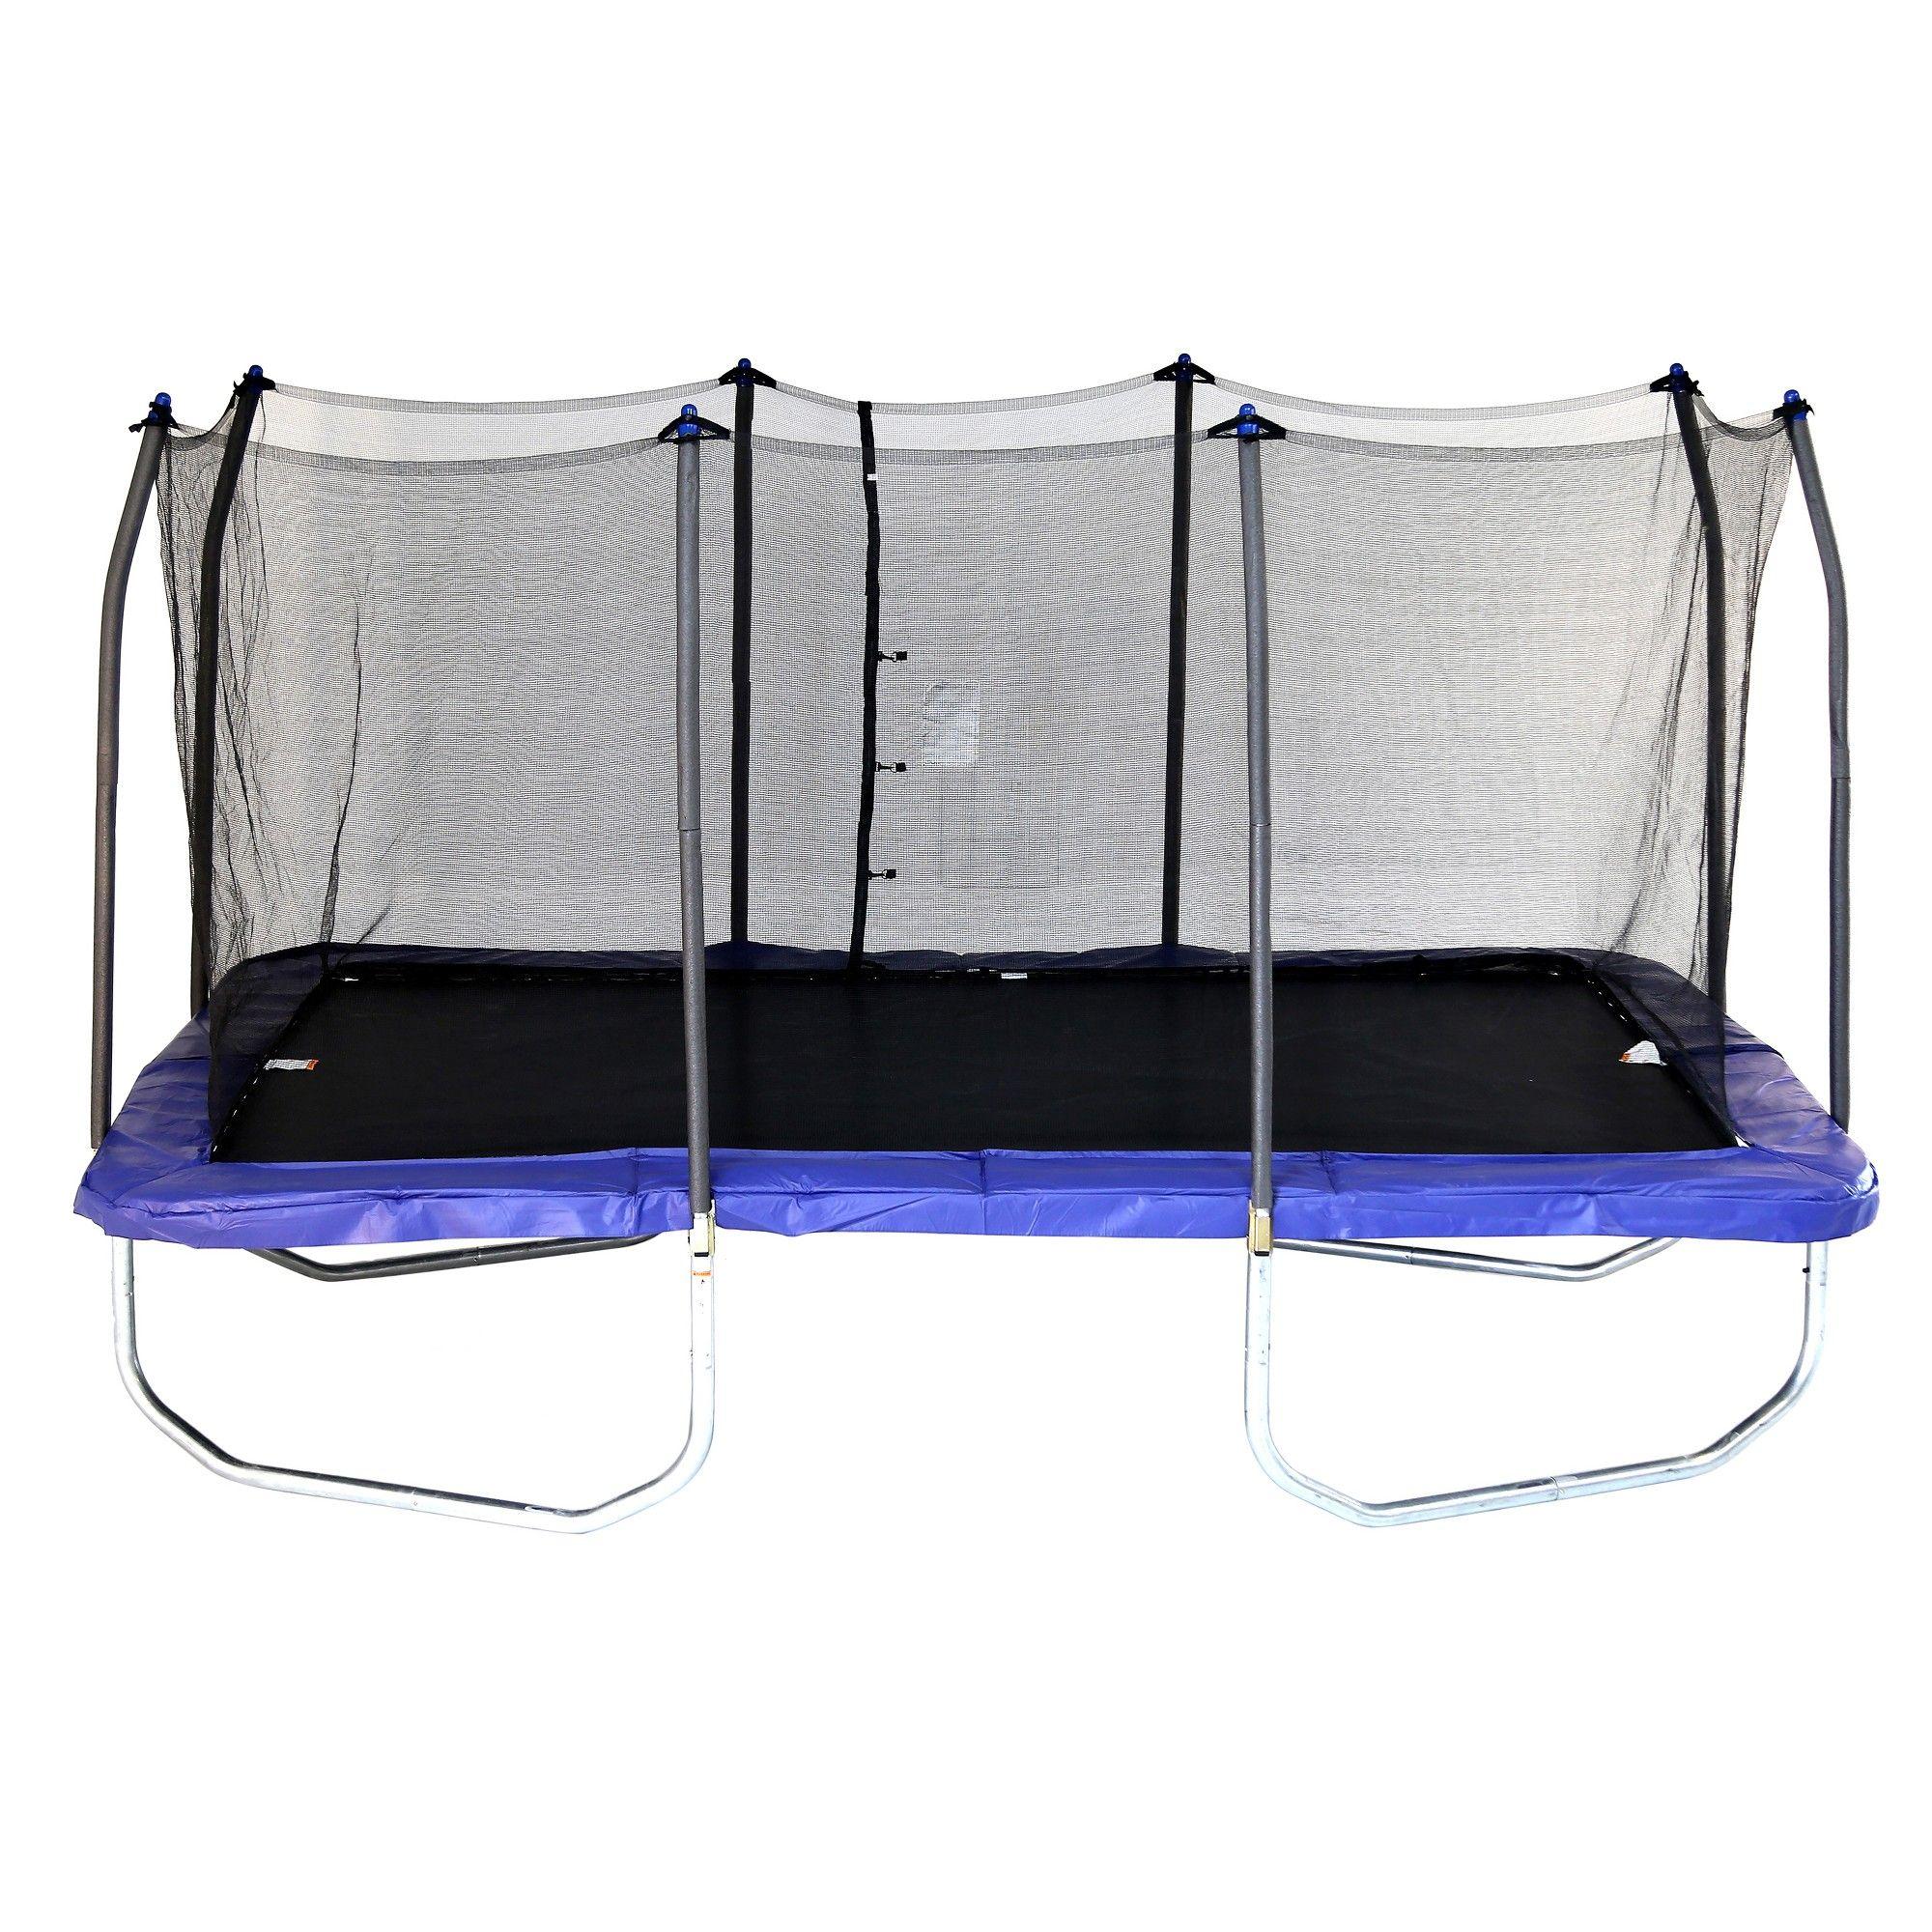 Skywalker Trampolines 15 Foot Rectangle Trampoline And Enclosure